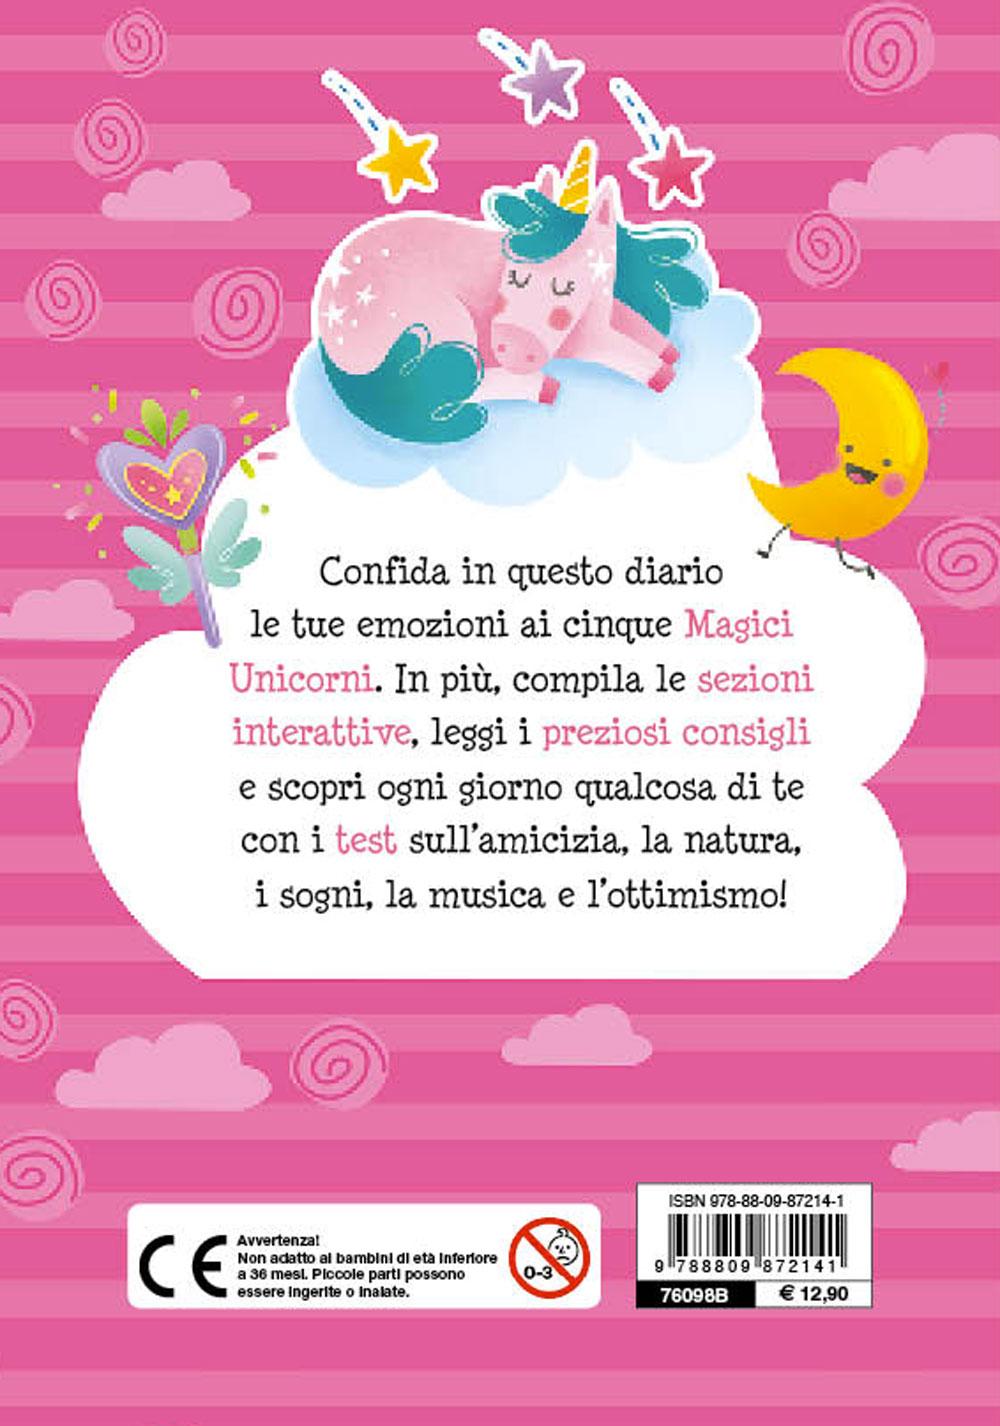 Il mio diario degli unicorni